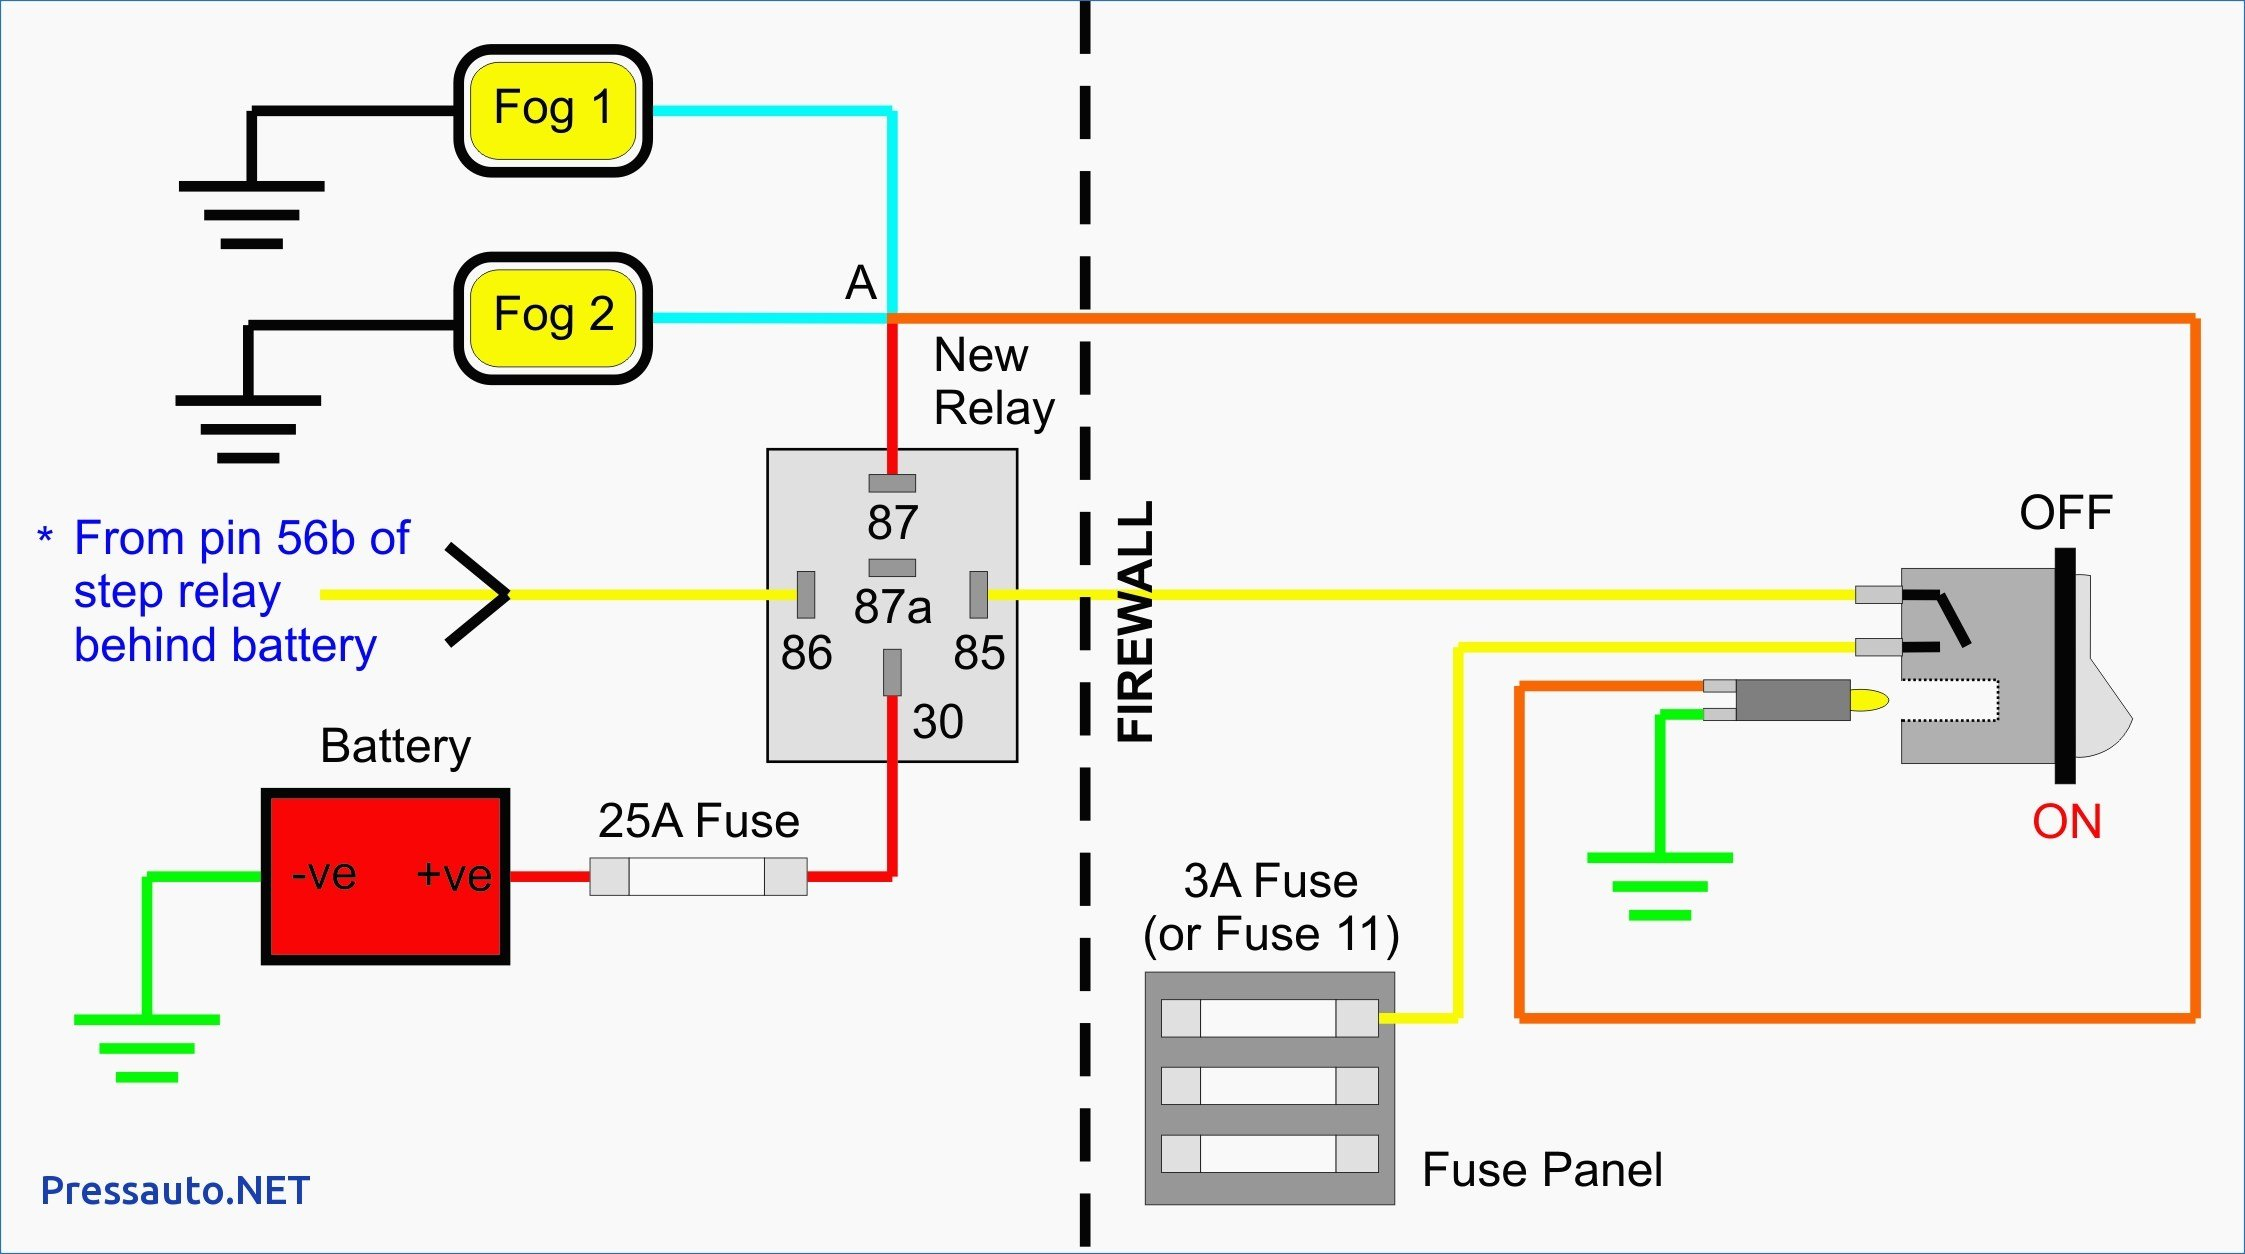 8 Pin Ice Cube Relay Wiring Diagram | Wiring Diagram - Ice Cube Relay Wiring Diagram